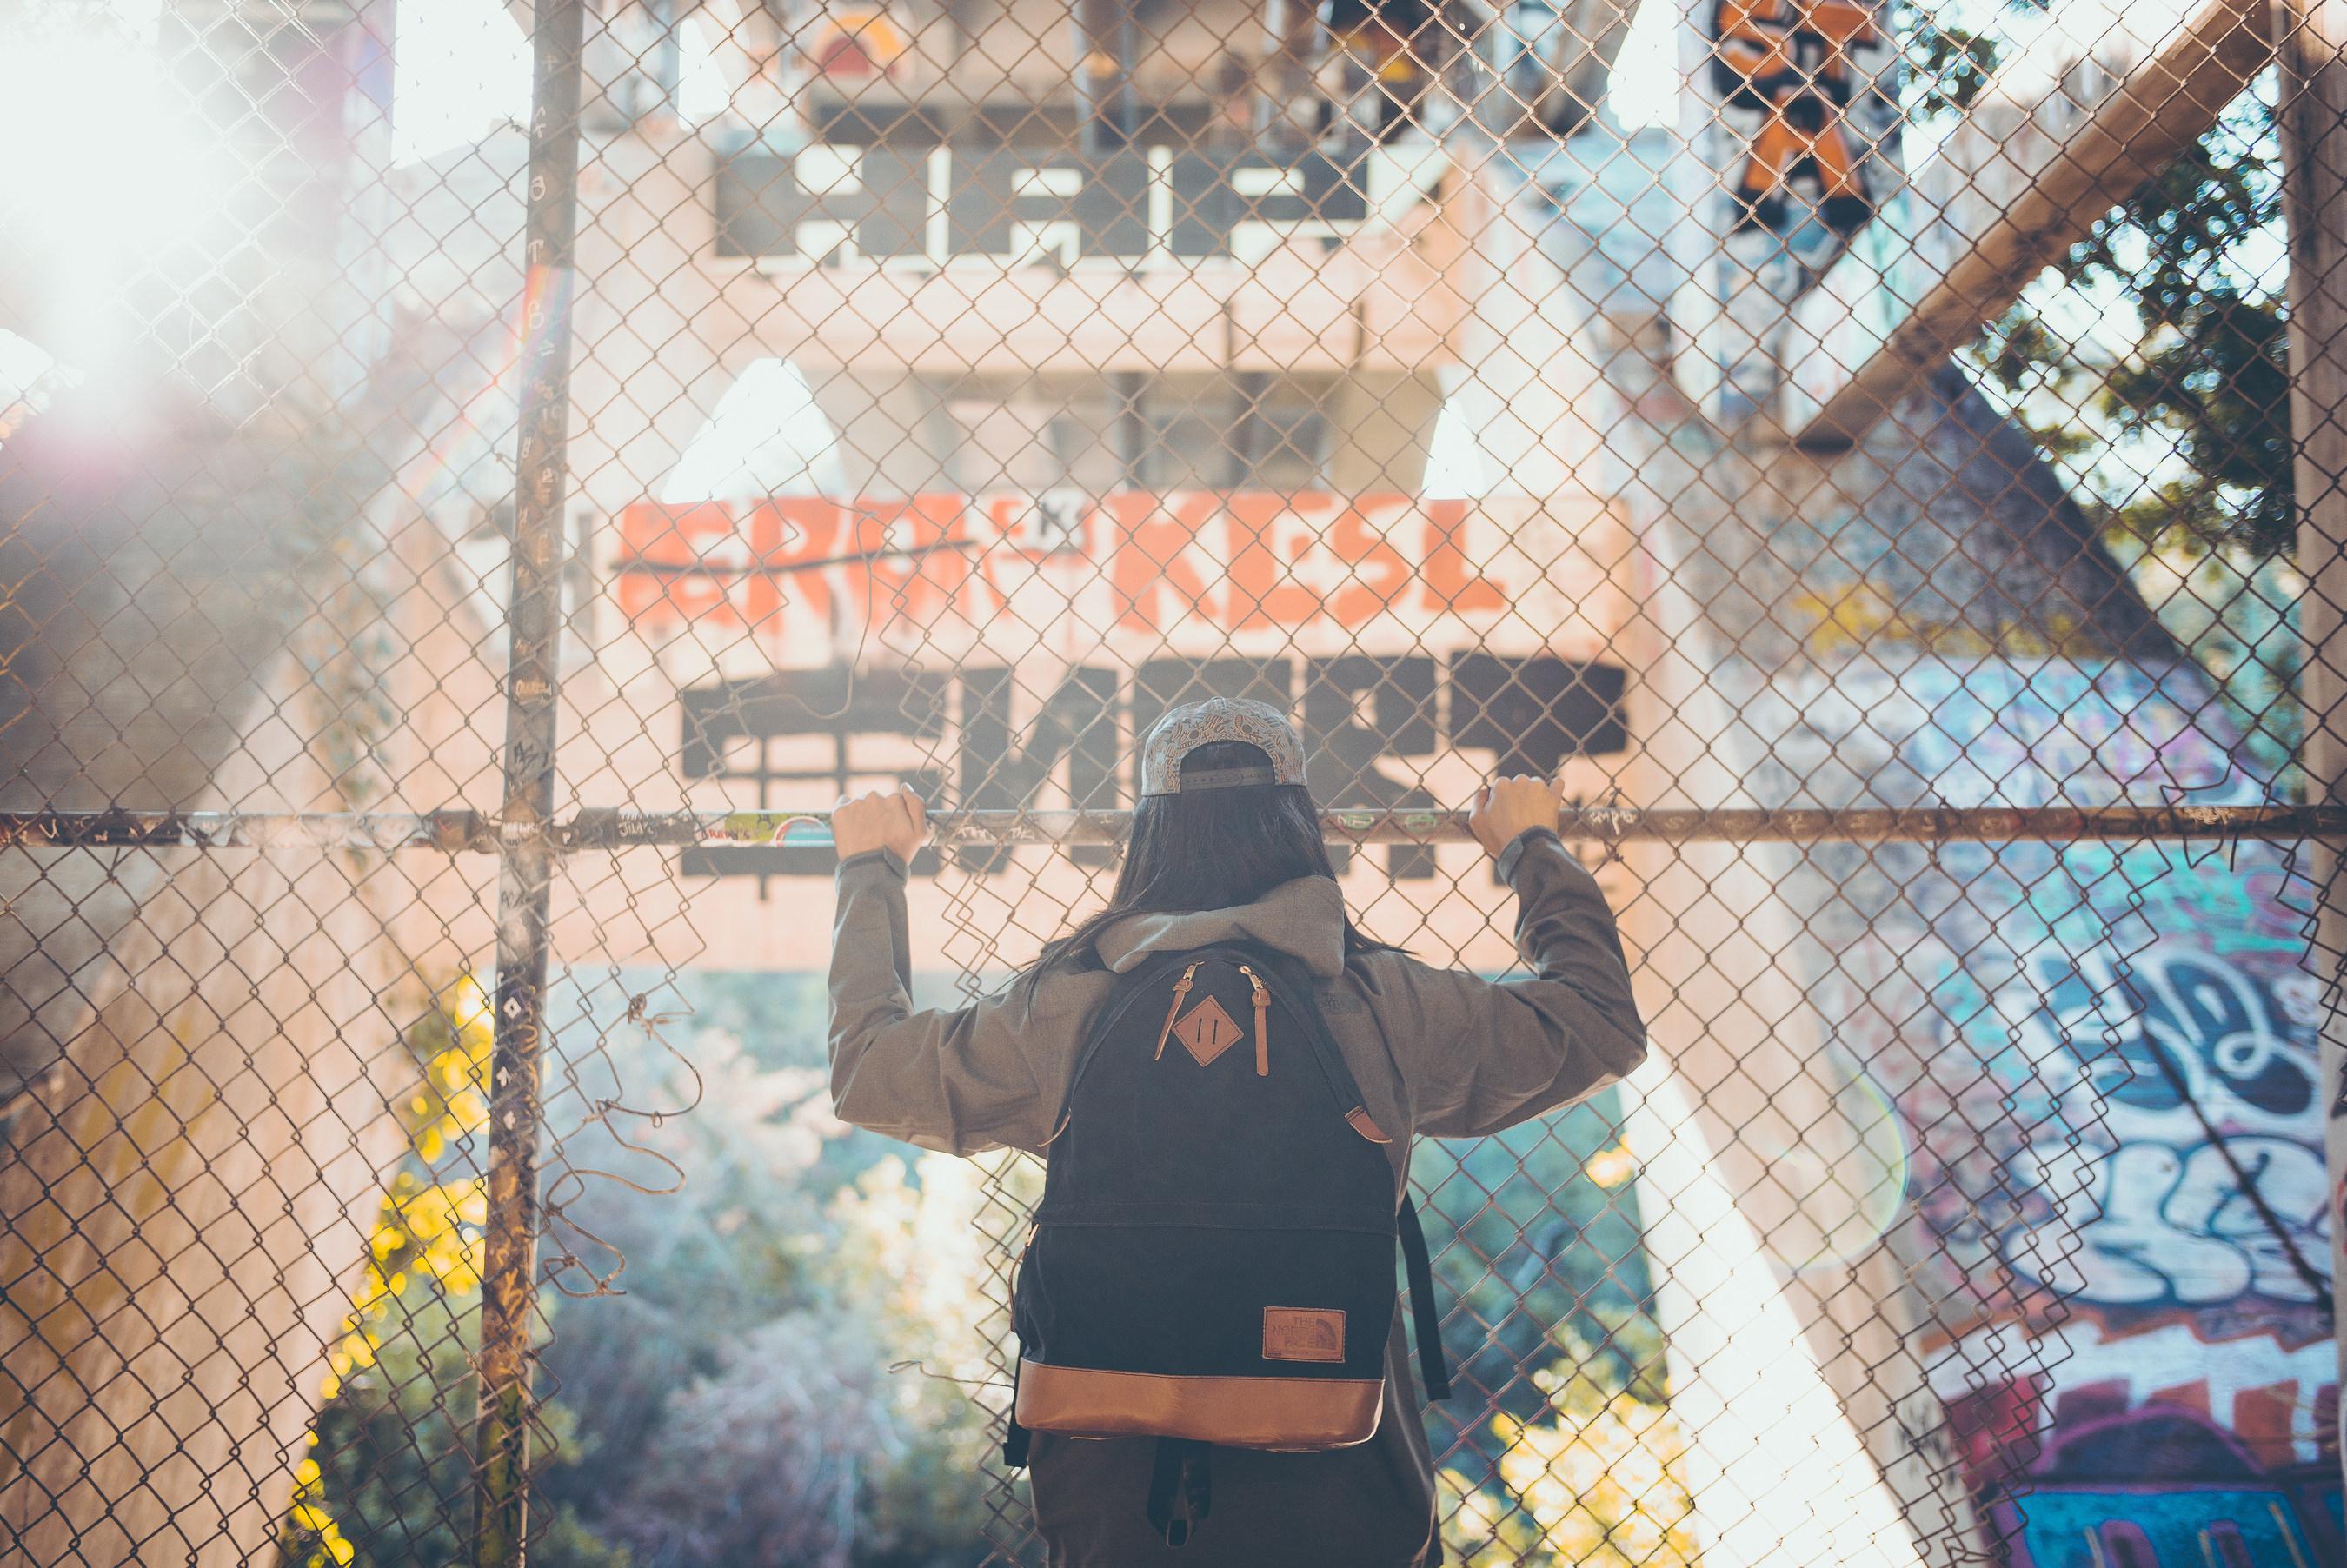 The North Face Urban Exploration Concept Shop is focused exclusively on the label's premium streetwear range. Photo Credit: @Nikk_La